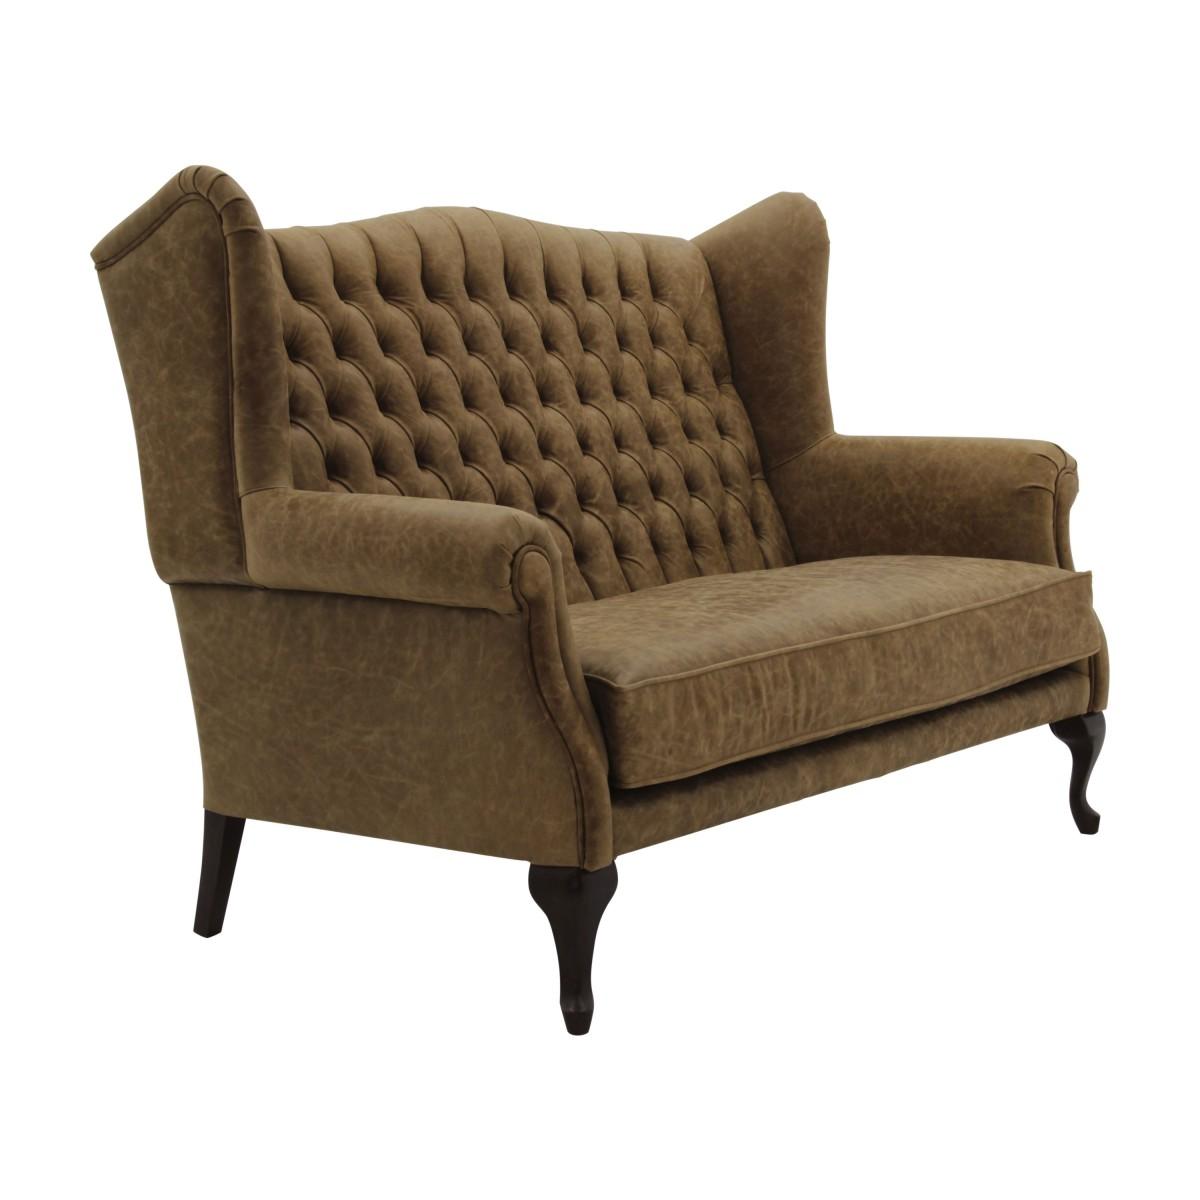 2 Seater sofa Old England - Sevensedie